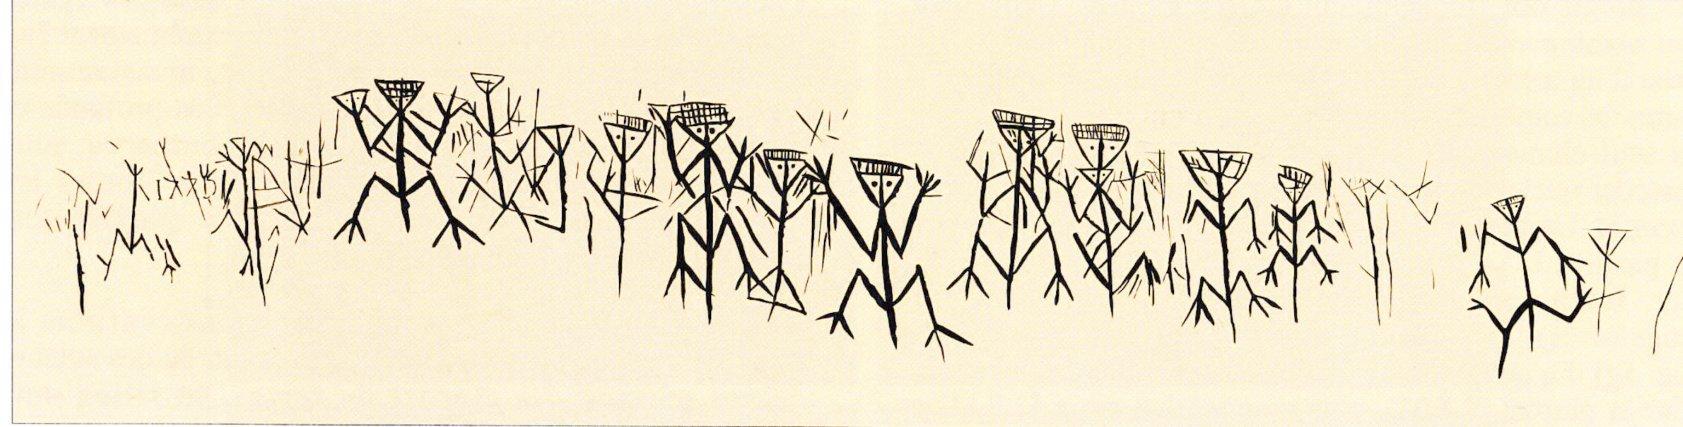 Frise d'anthropomorphes. Relevé Norbert Aujoulat (CNP, SATTAS)